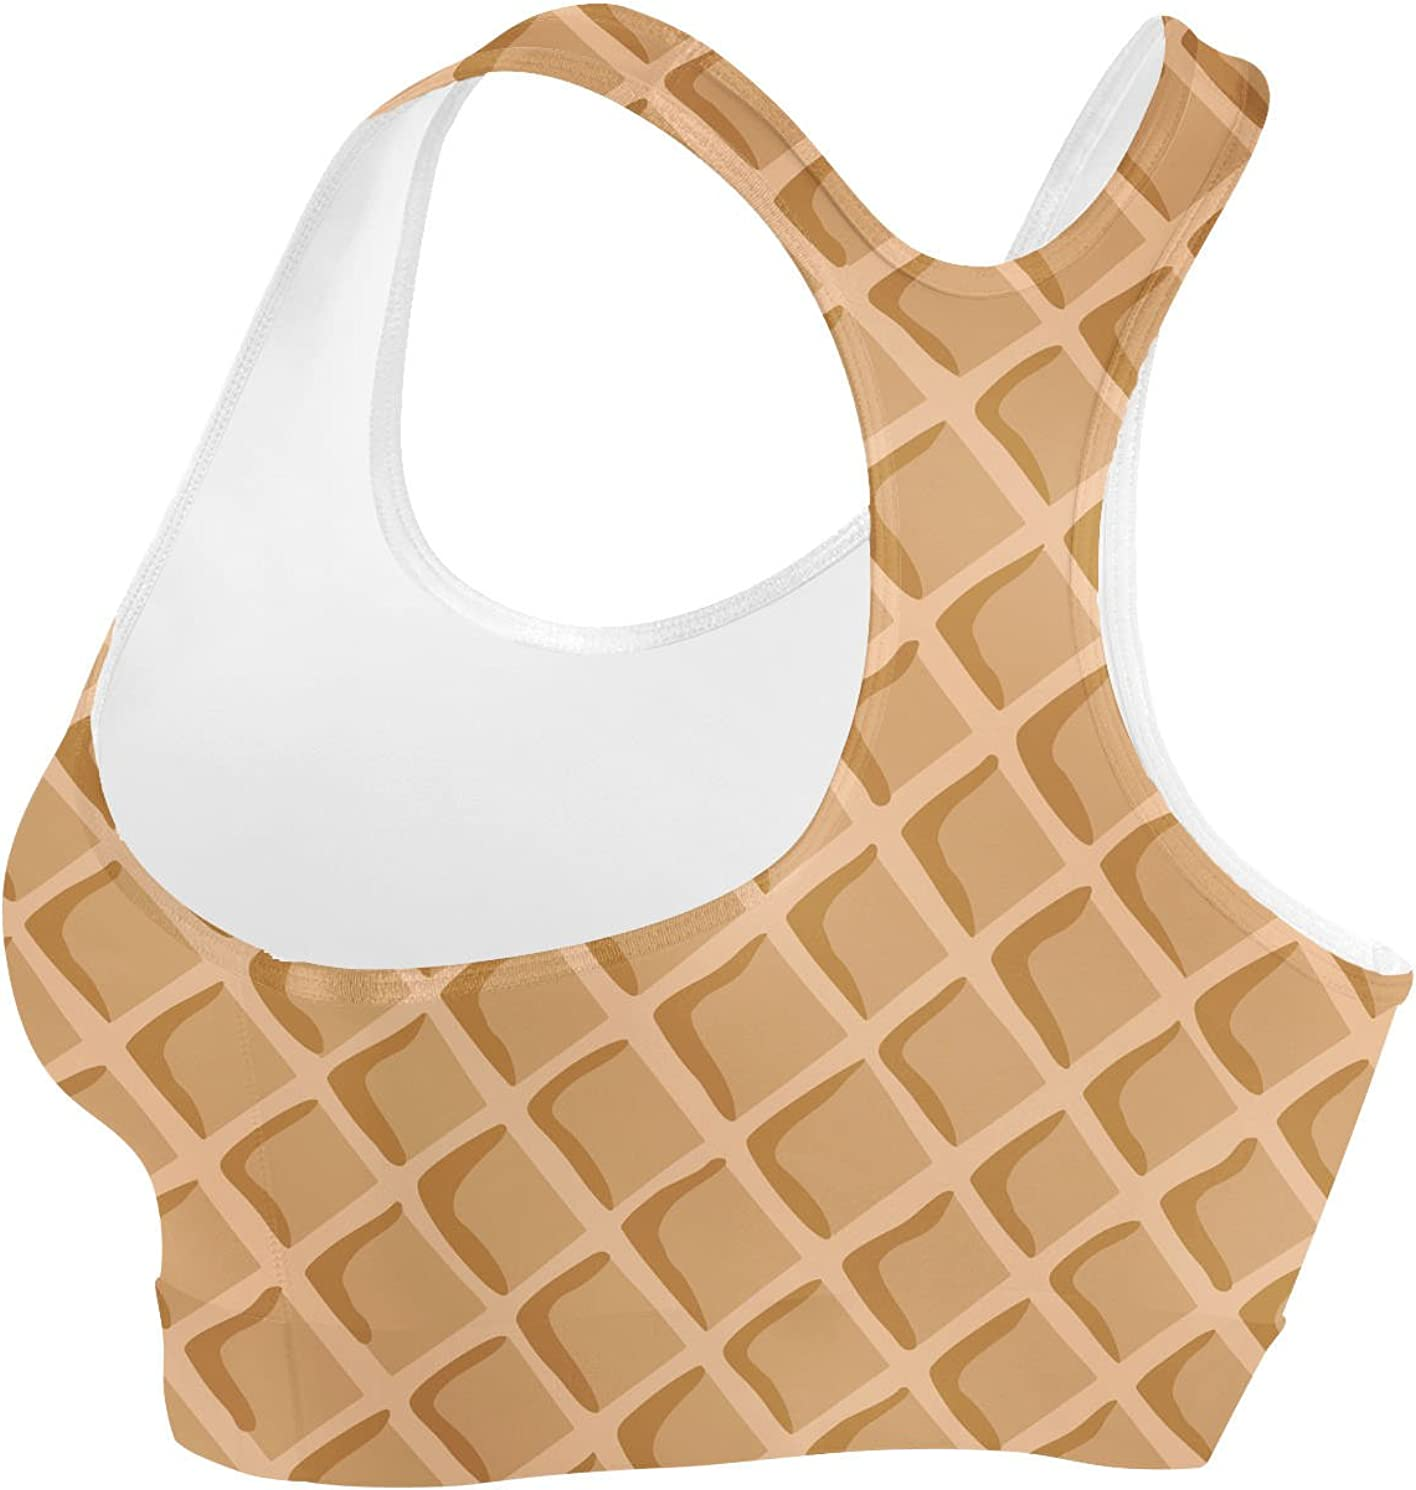 XS Icecream Waffle Cone Sports Bra